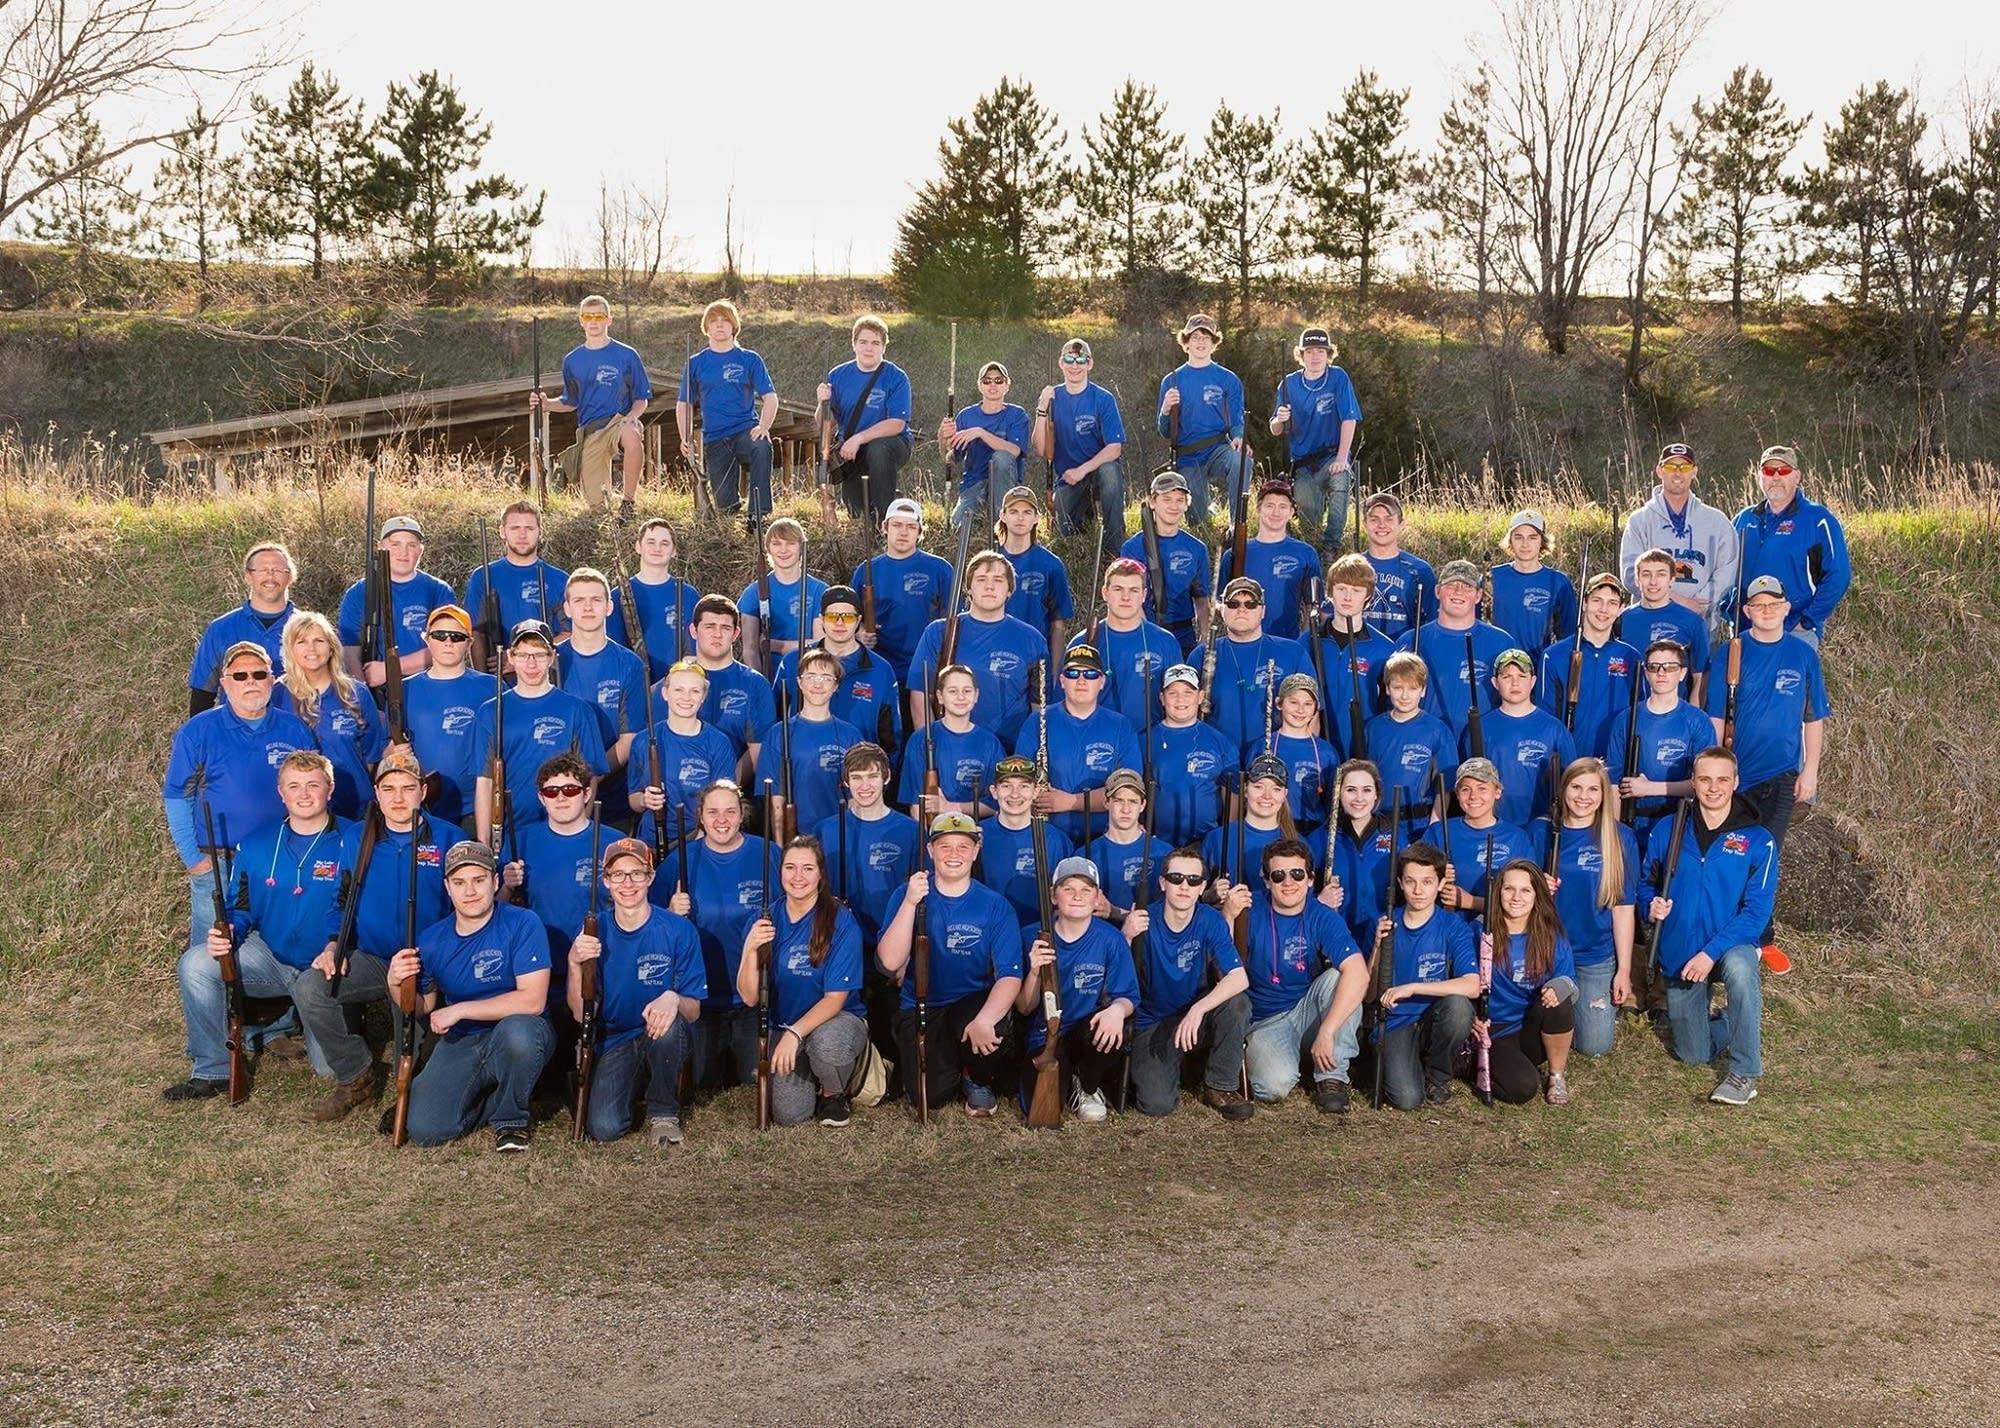 Big Lake High School's trapshooting team